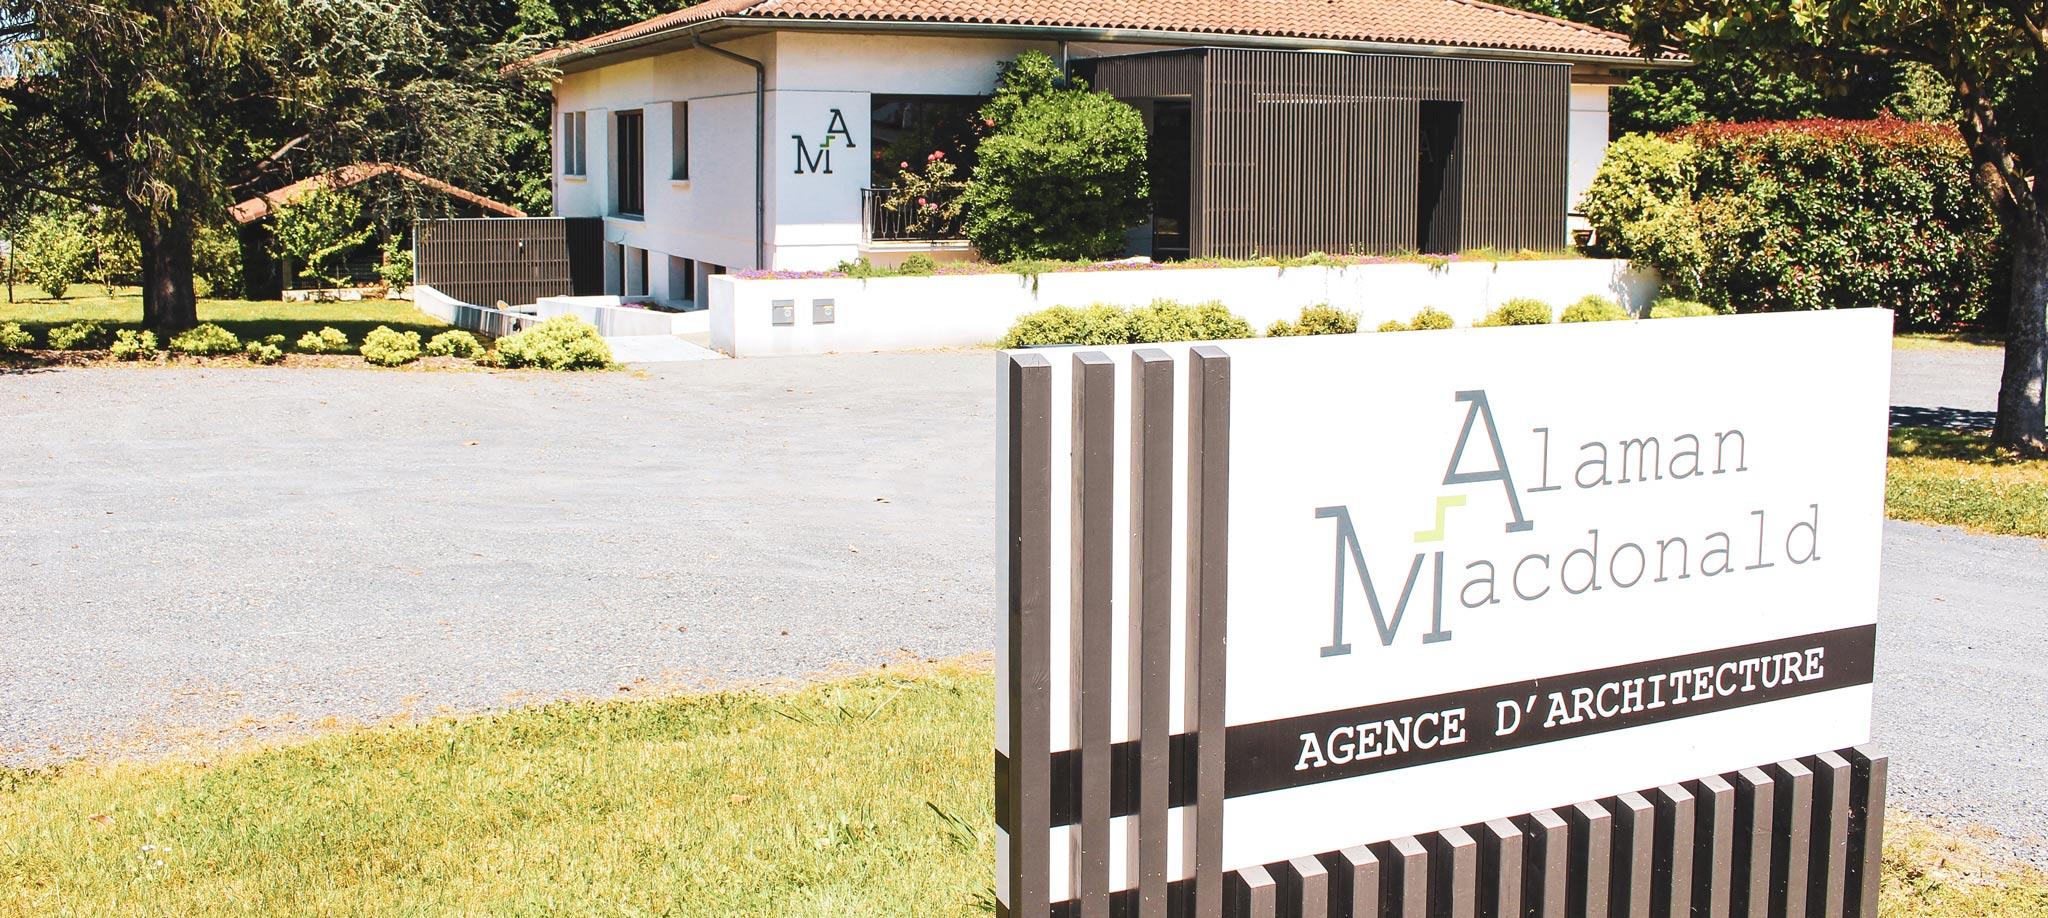 Alaman Macdonald Architecte Agence Alaman29 Grandformat